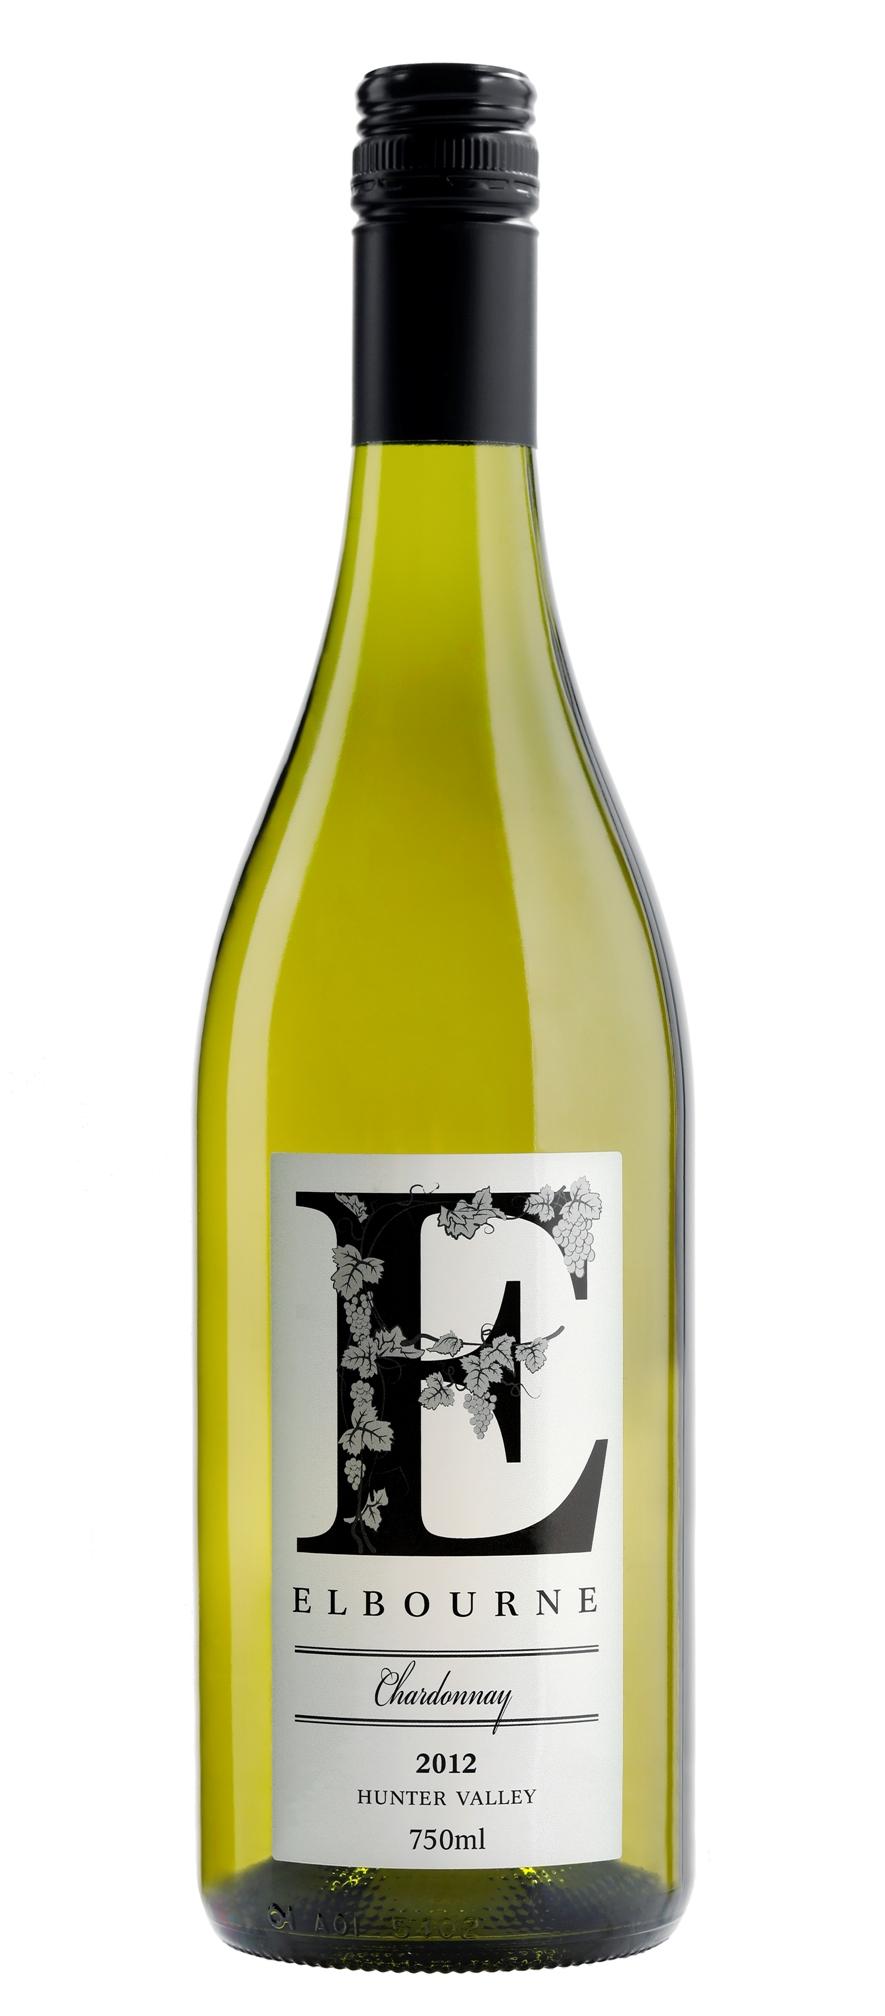 Elbourne Chardonnay 2012 small.jpg